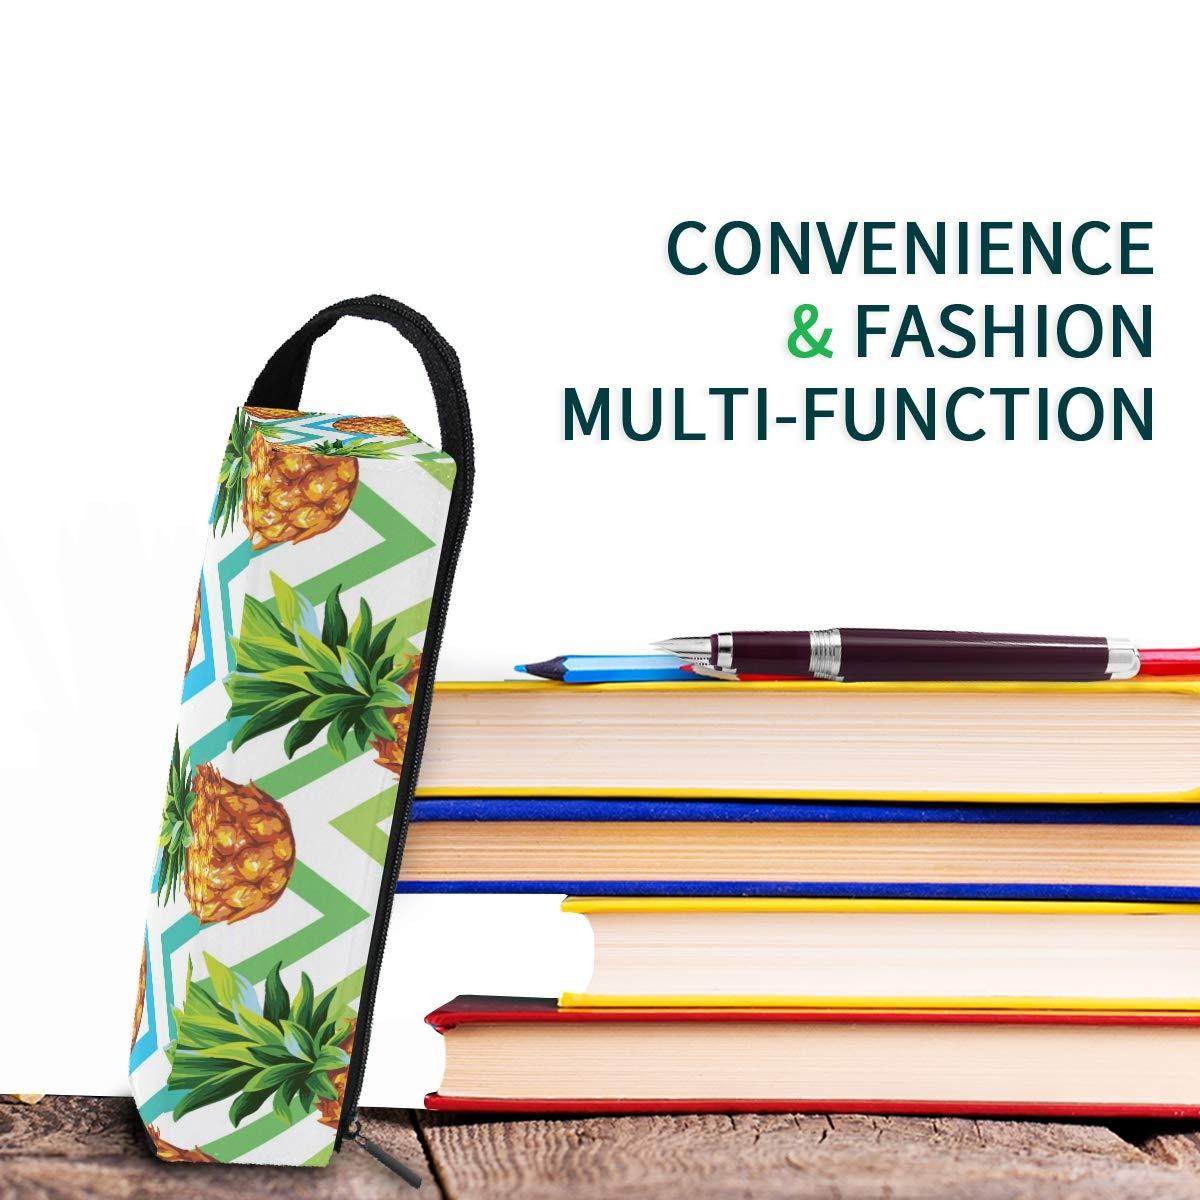 My Little Nest Eyeglass Sunglasses Holder Pouch Bag Pineapple Geometrical Multi Function Zipper Pen Case Pencil Bag Organizer